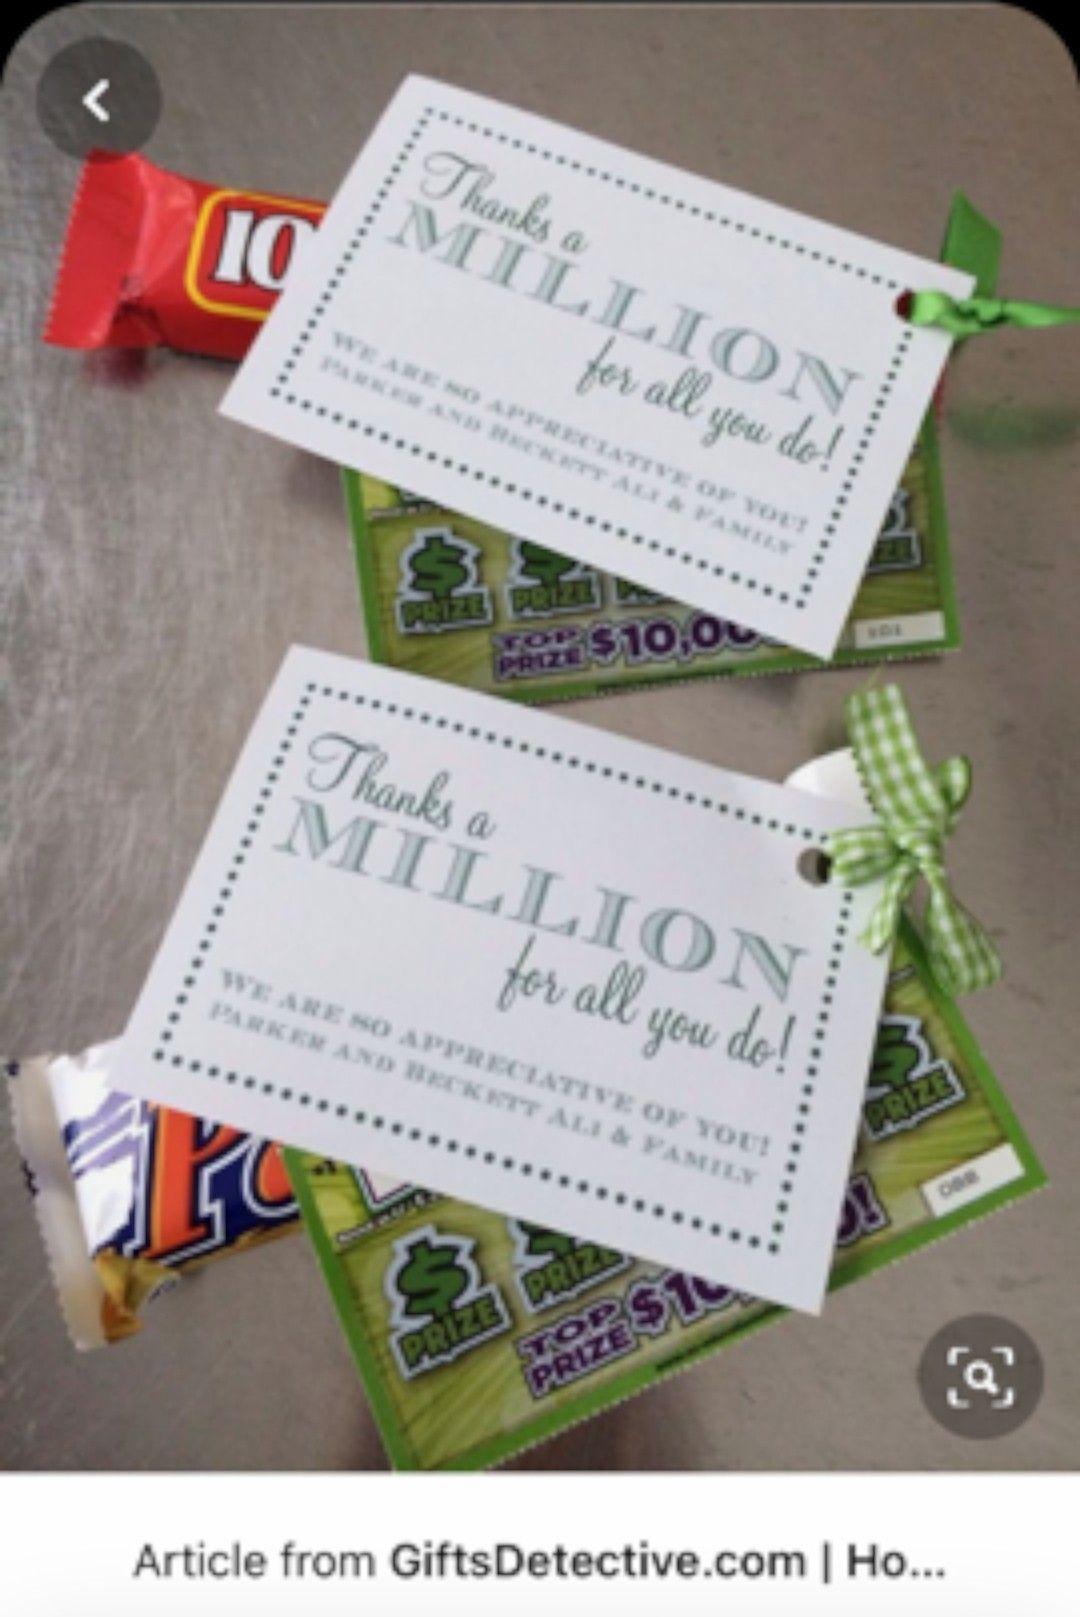 Pin by Jennifer on Gift ideas Employee gifts, Thank you